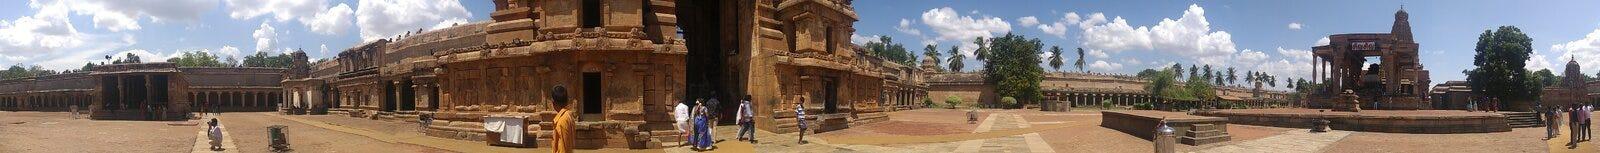 Thanjavur immagini stock